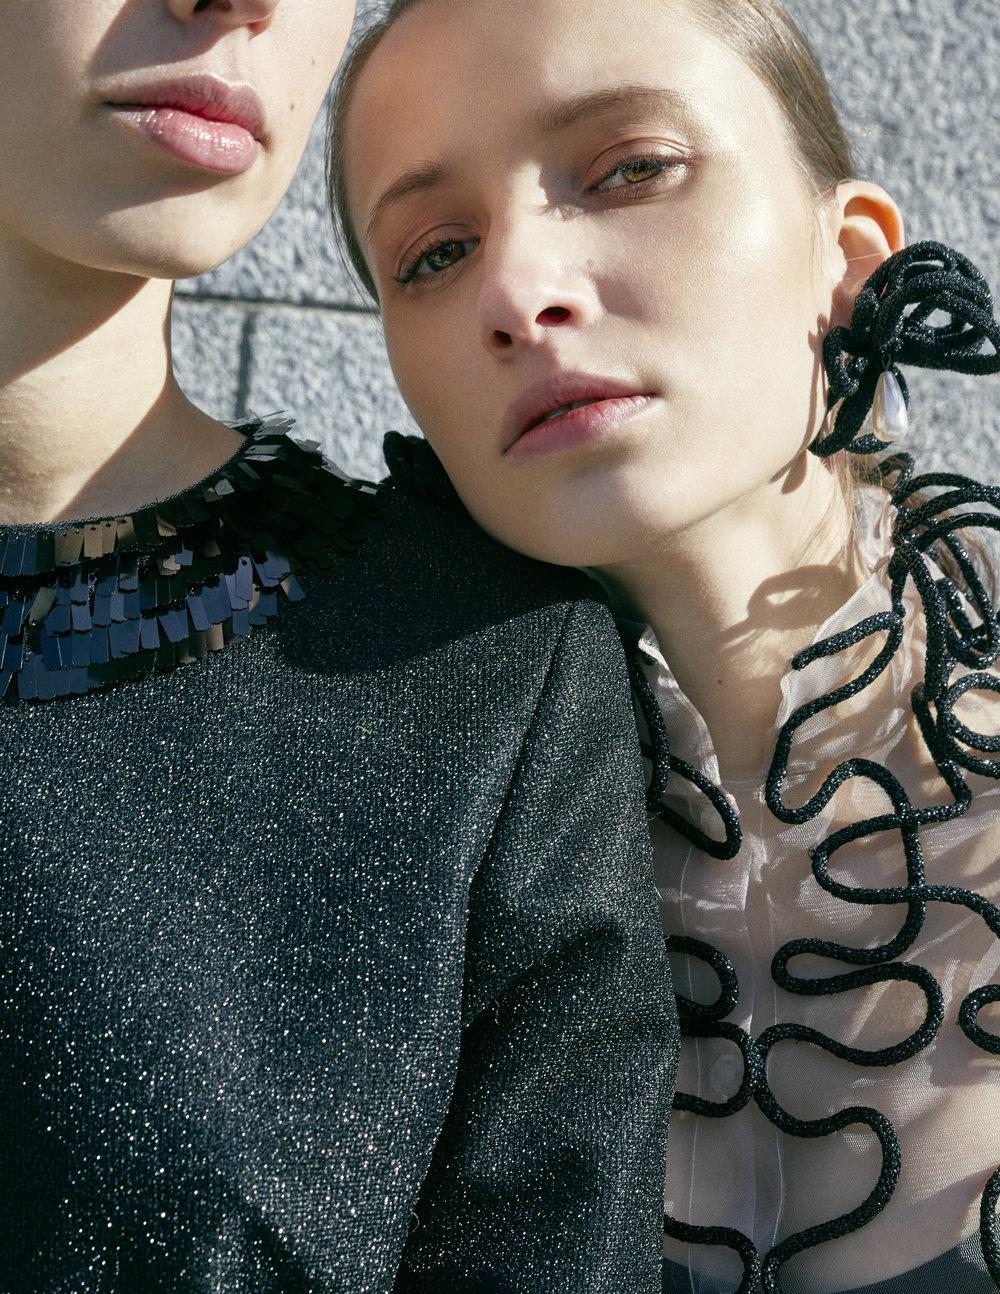 Sous le ciel de Madrid - Model: Sasha ChulkovaModel: Paula BhritoPhotographer: Mª Teresa Sánchez PalomoWardrobe Stylist/Fashion Designer: Christina PriethAssistant: Irene Rosa